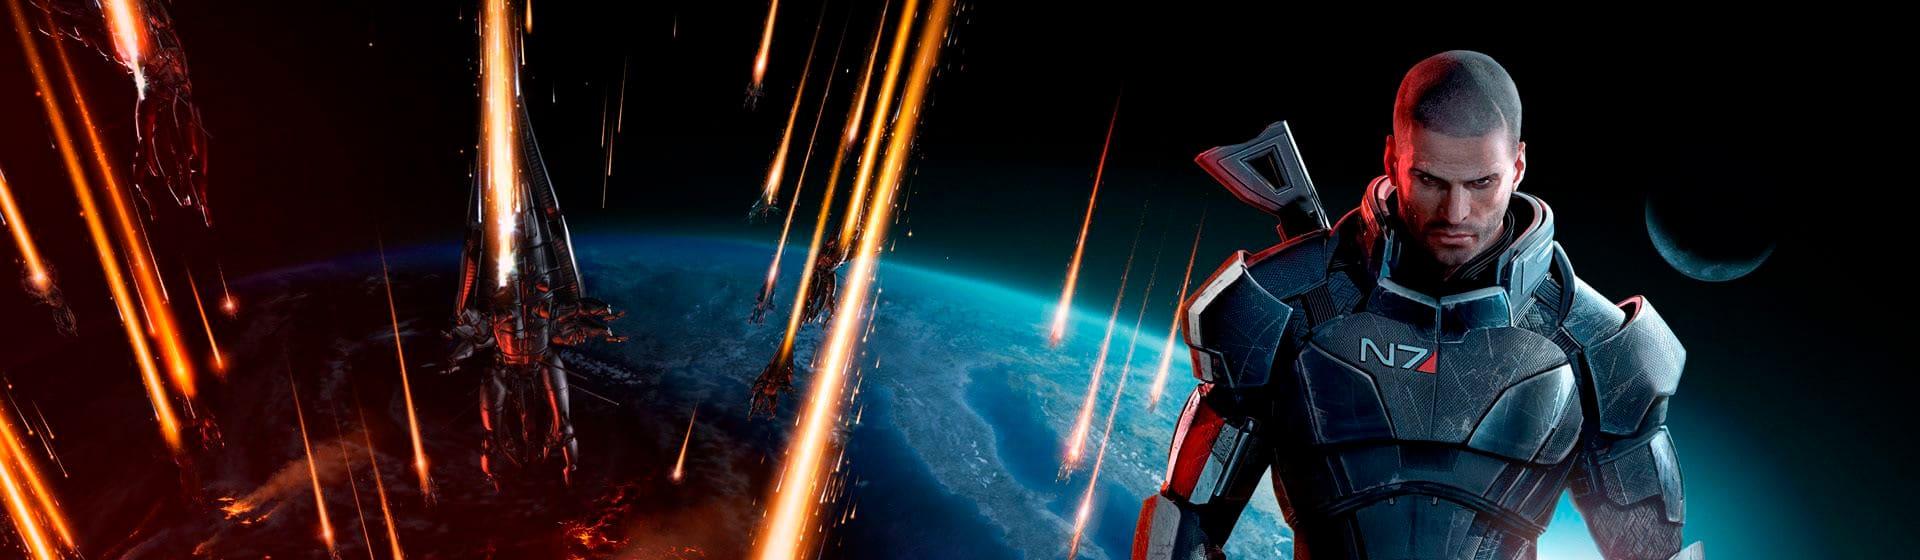 Mass Effect - Мерч и одежда с атрибутикой